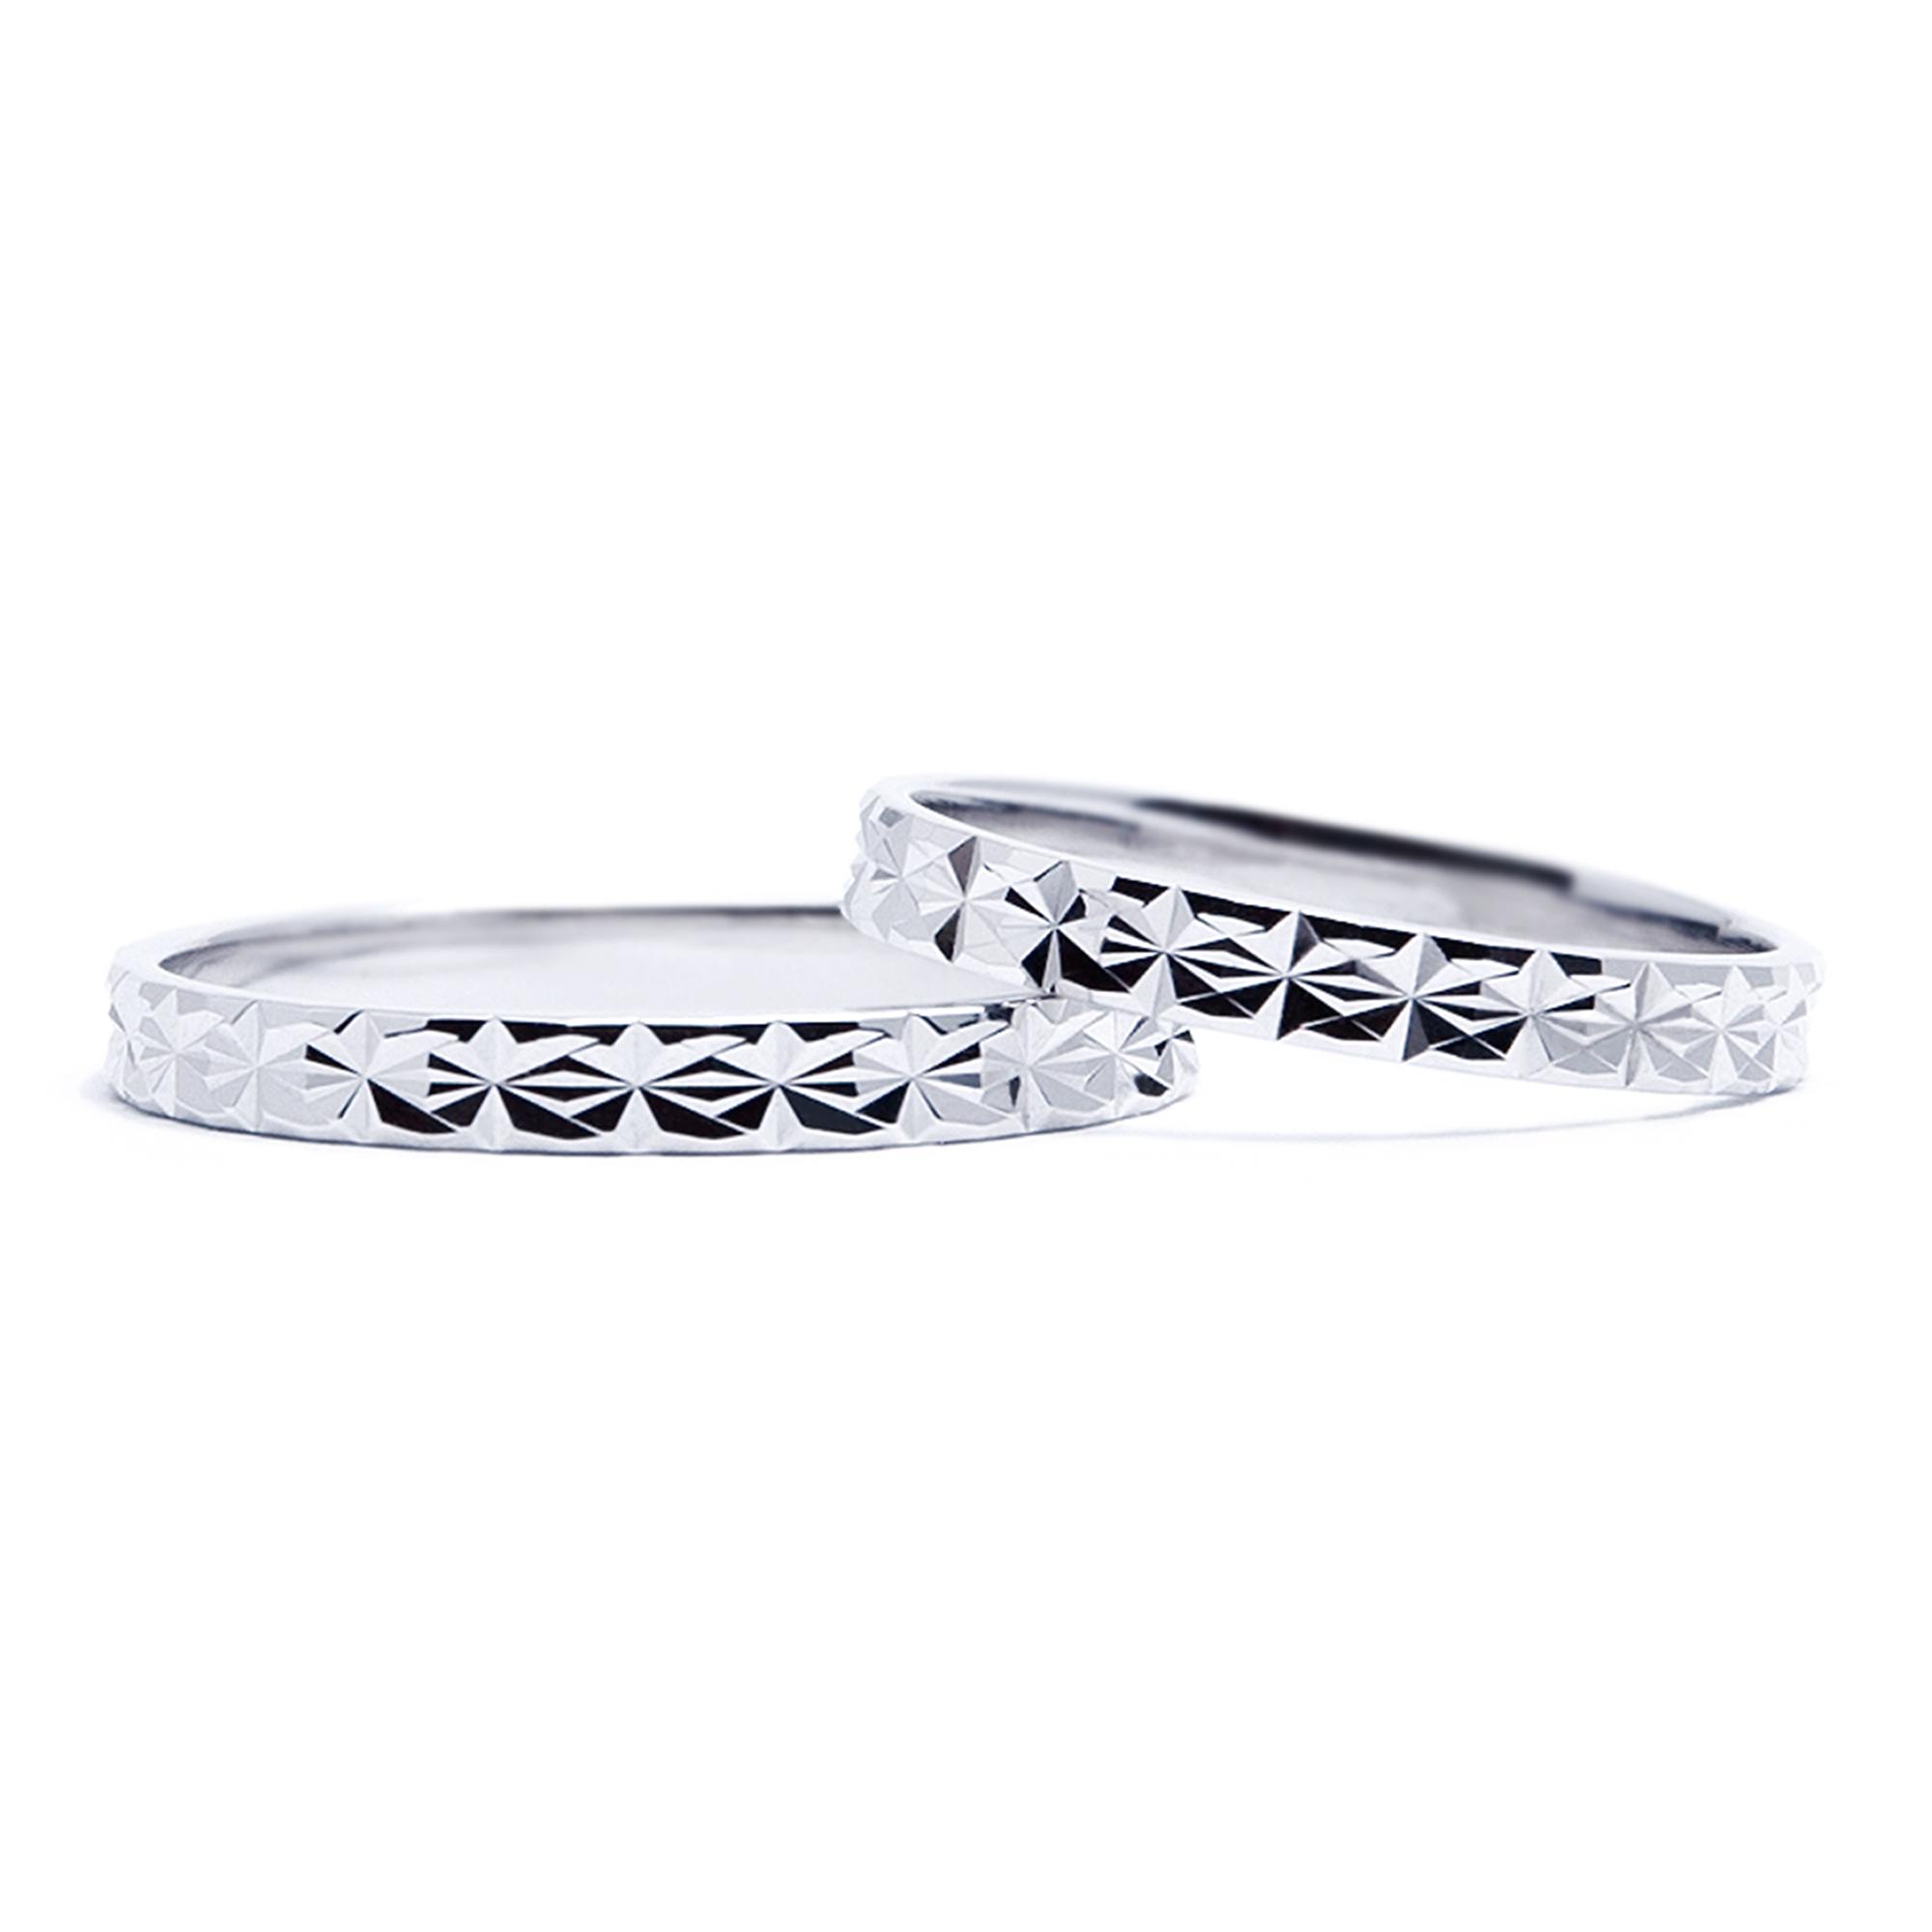 輪高崎工房の結婚指輪|Aisne